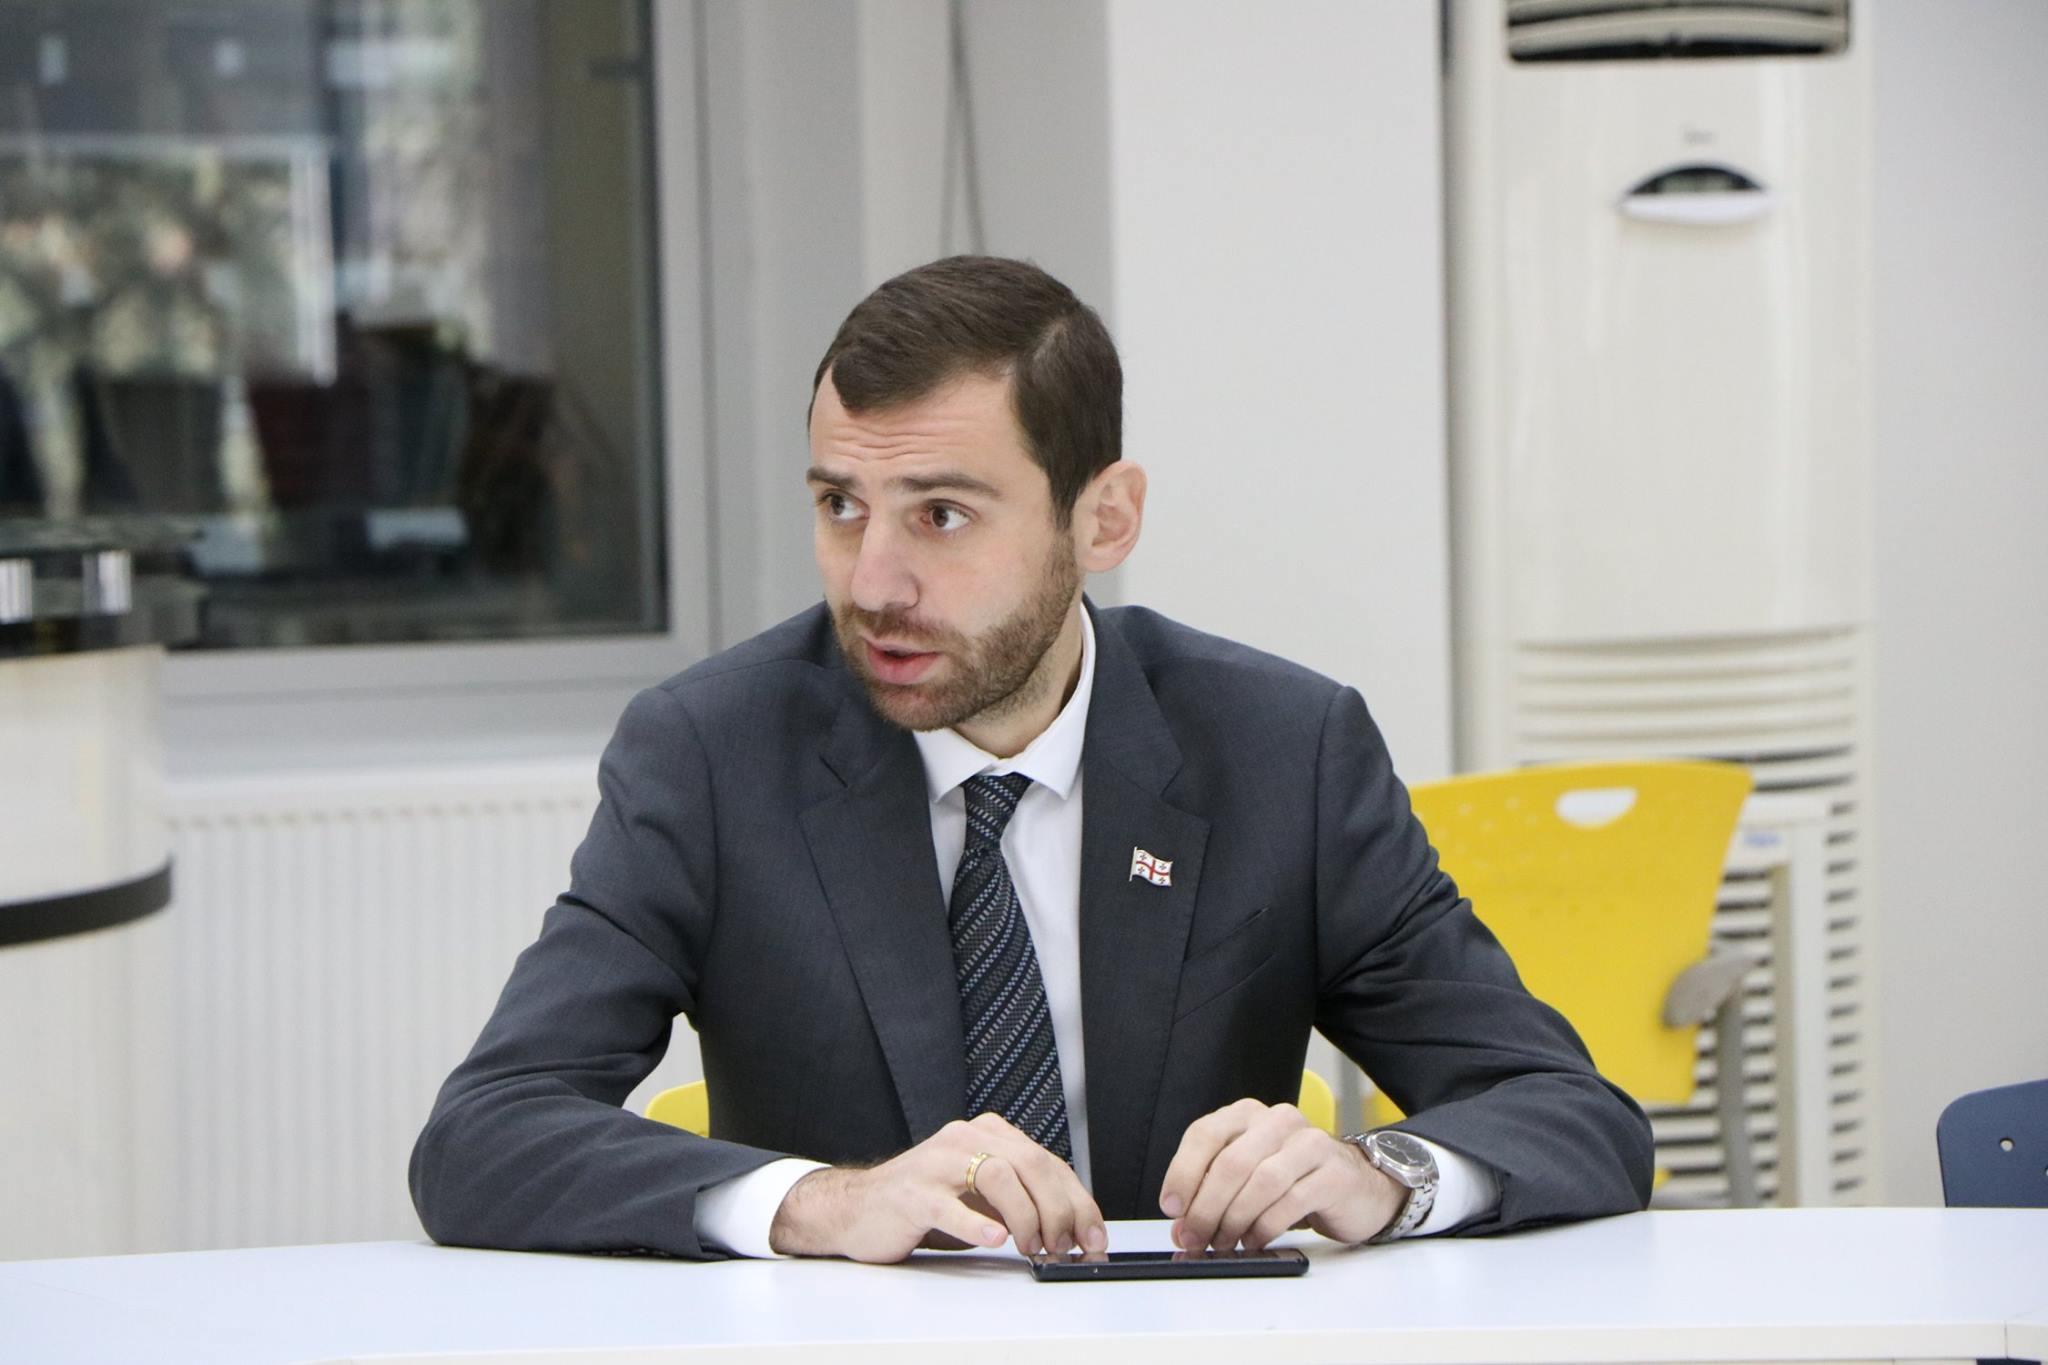 Giorgi Abashishvili #новости Георгий Абашишвили, Георгий Гахария, Леван Долидзе